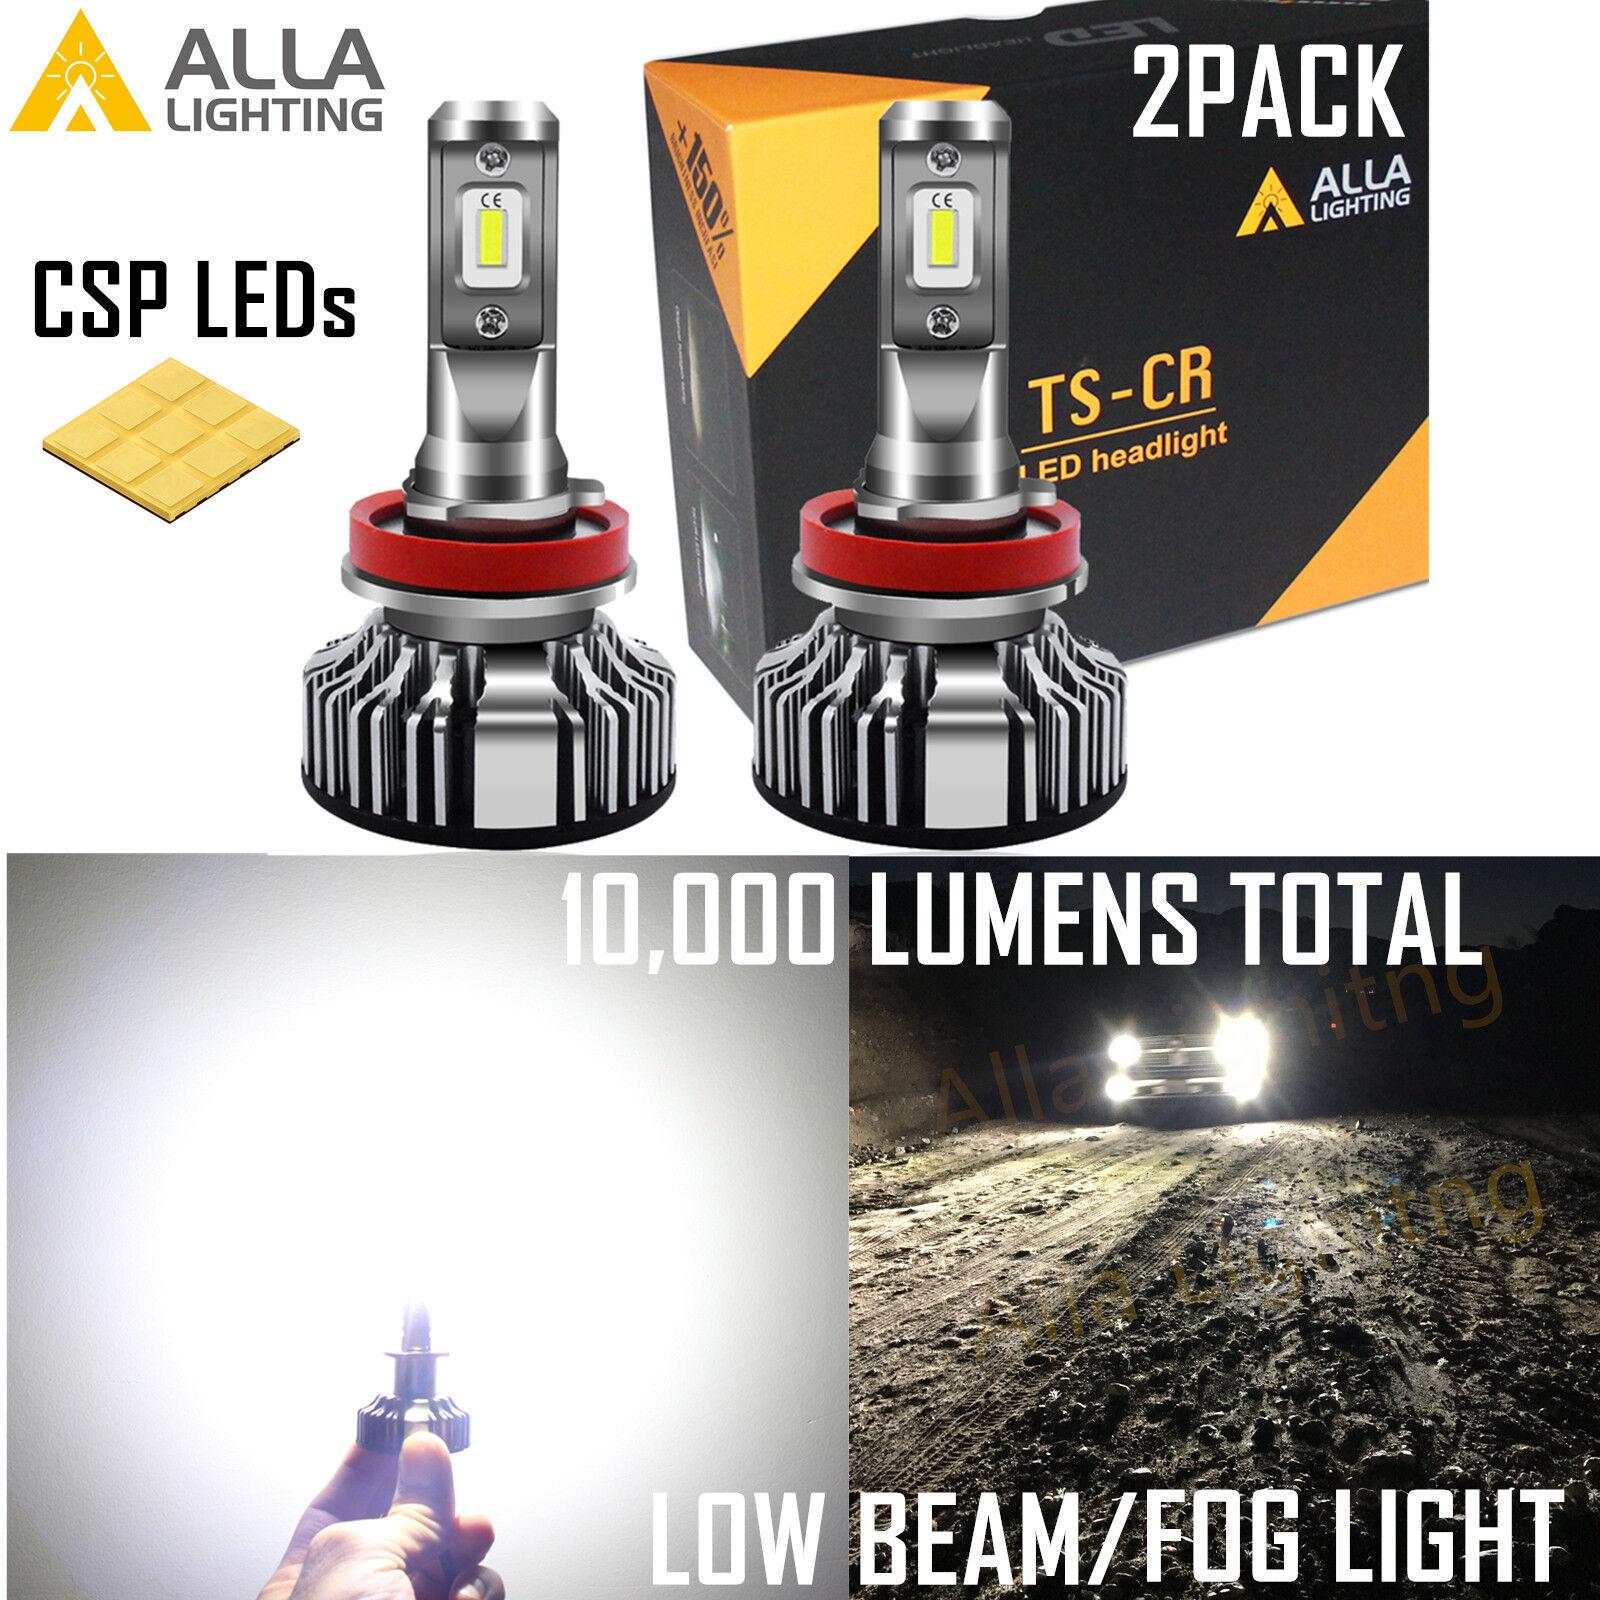 Alla Lighting LED H11 Fog Light Bulb|Headlight Bright High|Low Beam EZ